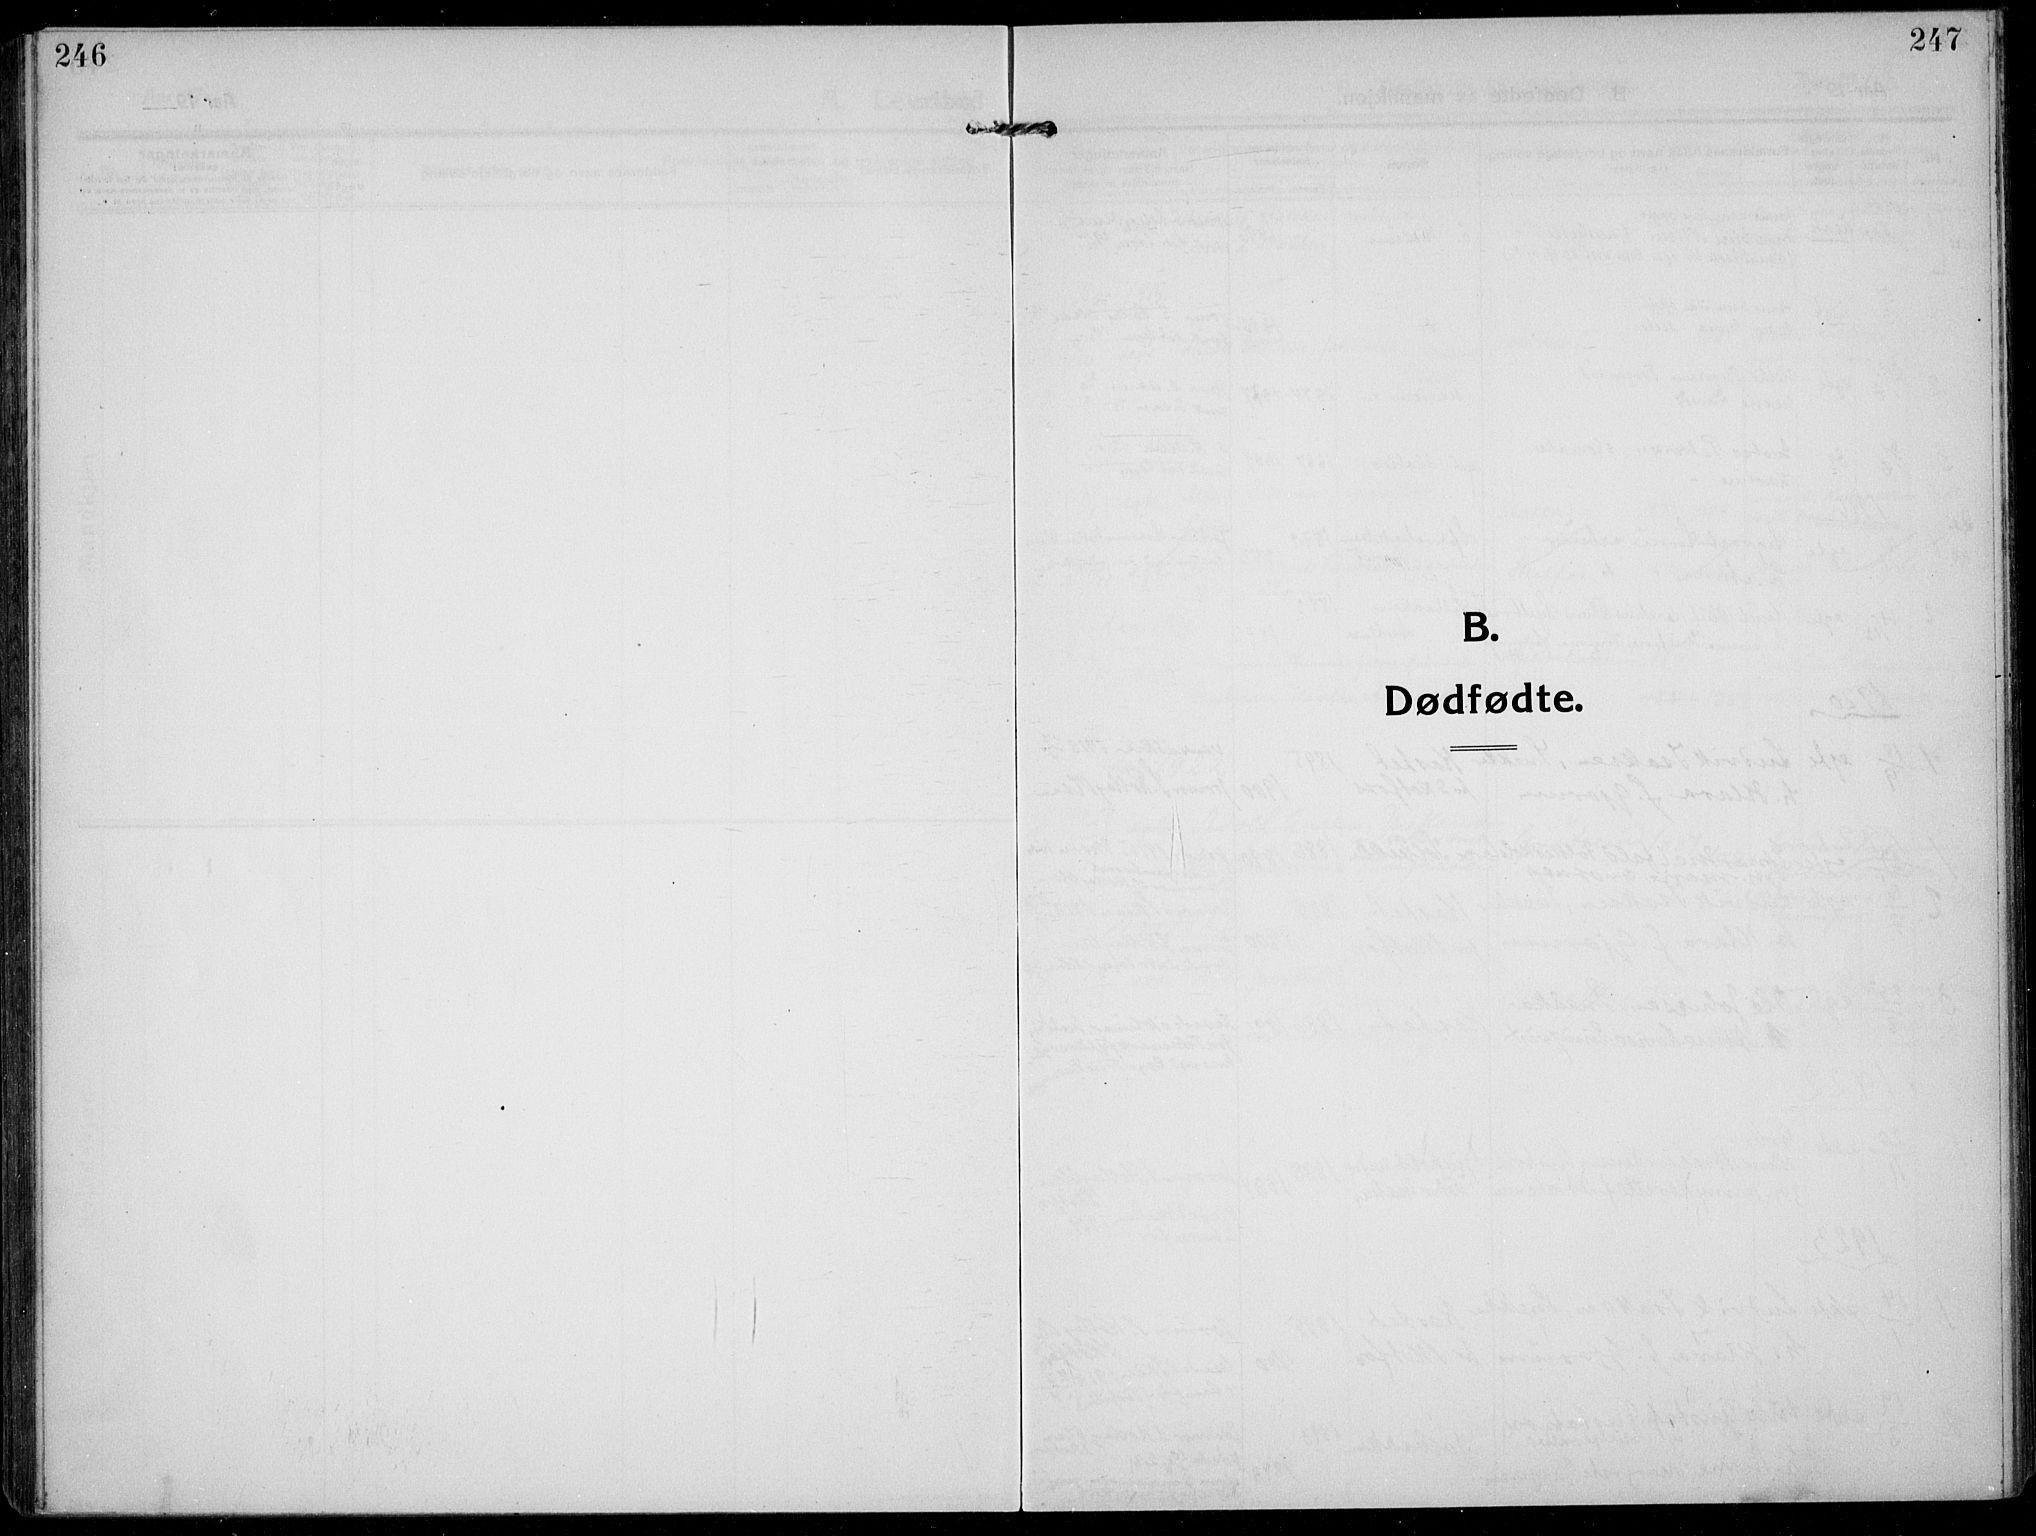 SAKO, Solum kirkebøker, F/Fb/L0004: Ministerialbok nr. II 4, 1913-1924, s. 246-247